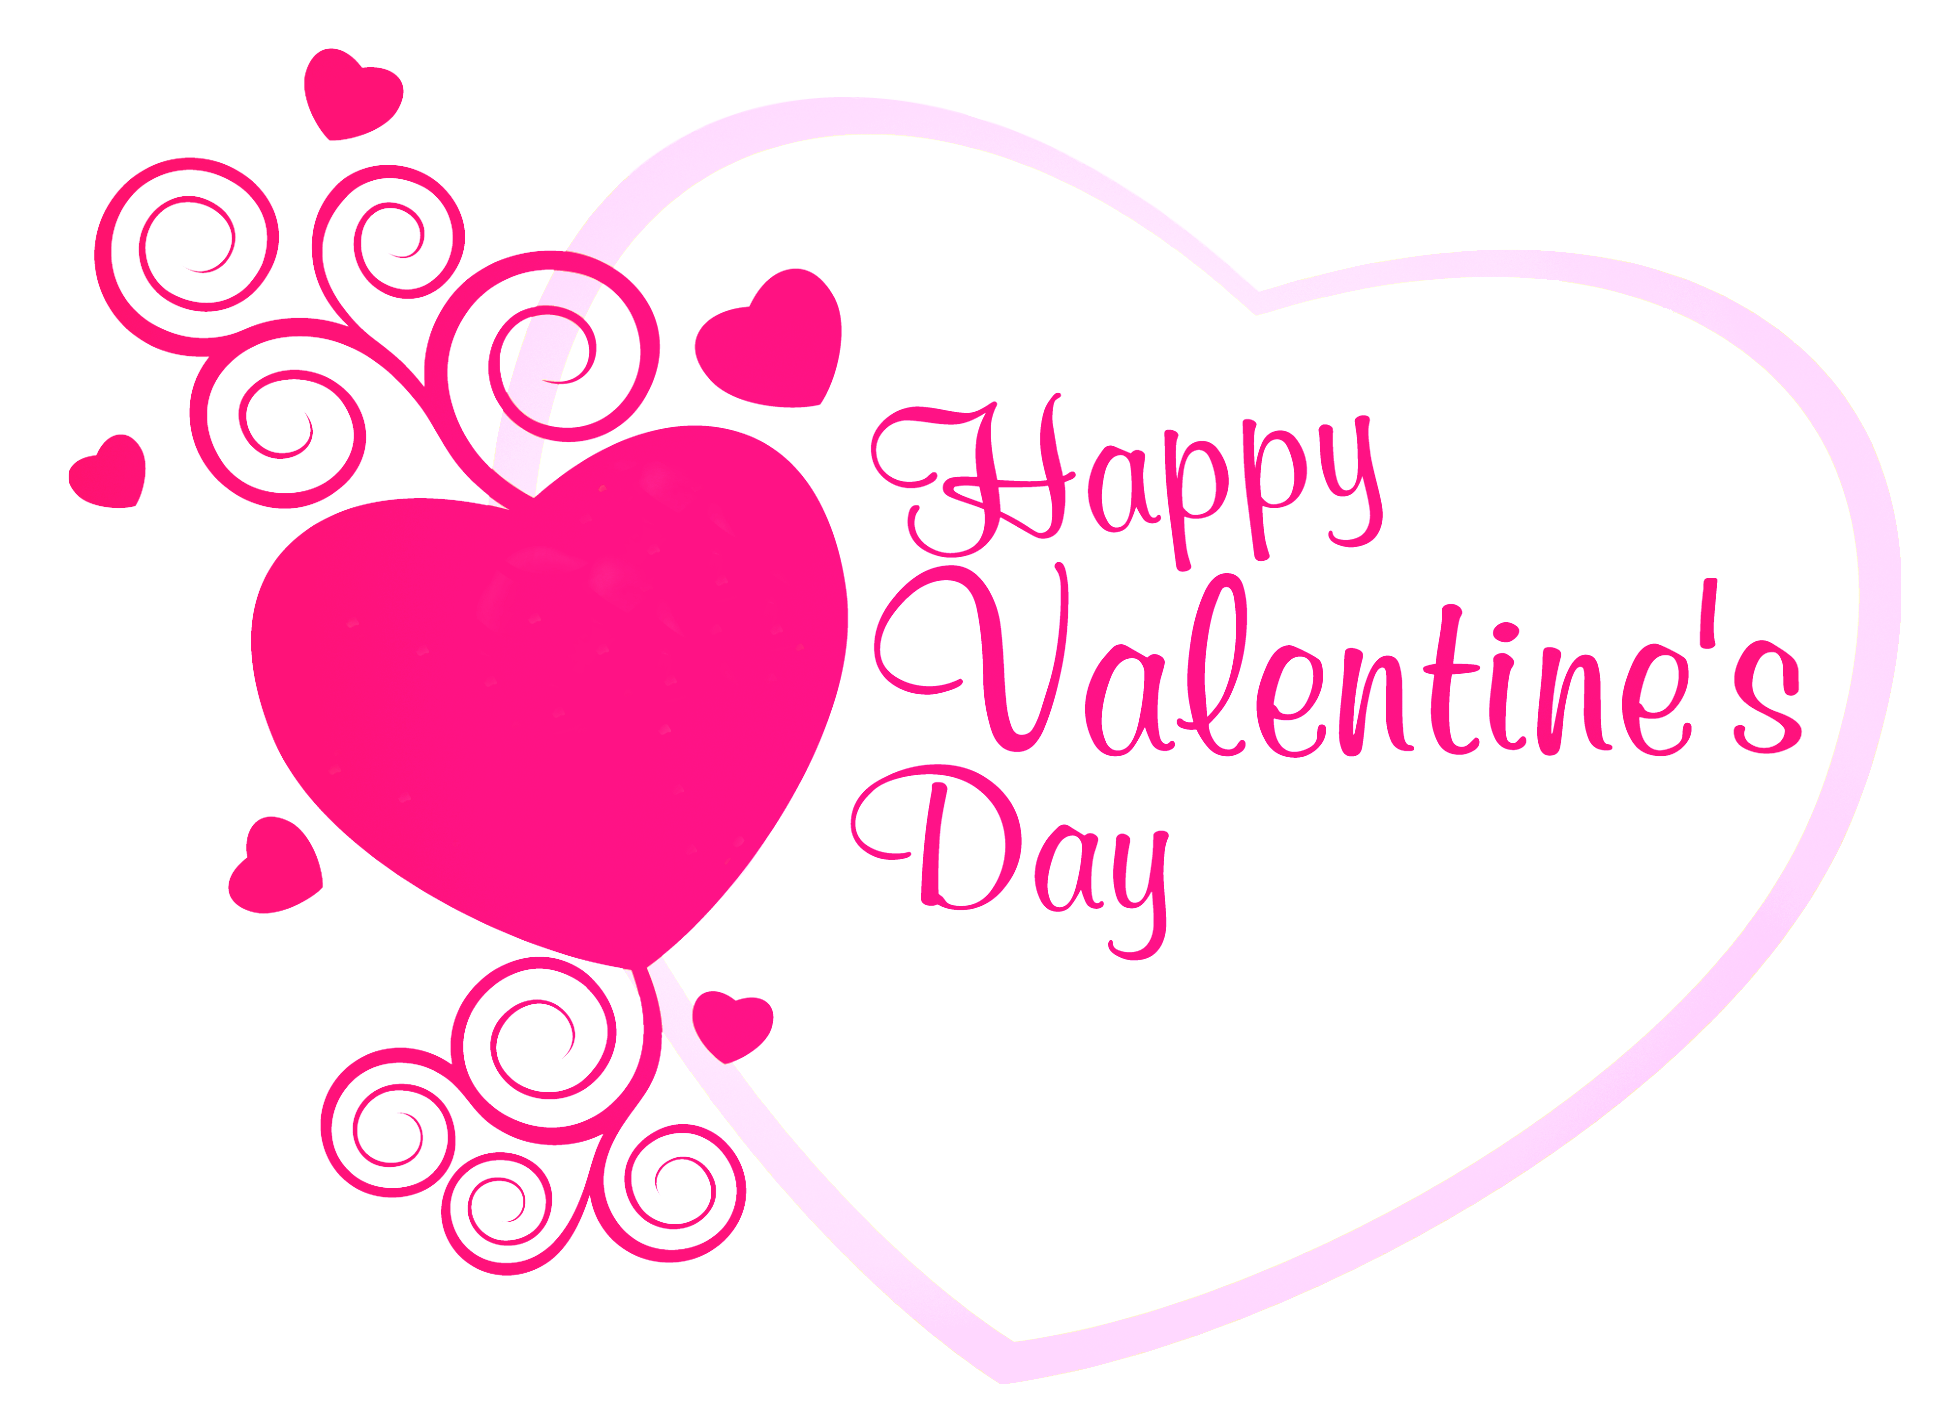 Valentines Day Hearts Happy Valentines Day Pictures Clipart Happy Valentines Day Pictures Happy Valentines Day Wishes Happy Valentines Day Images